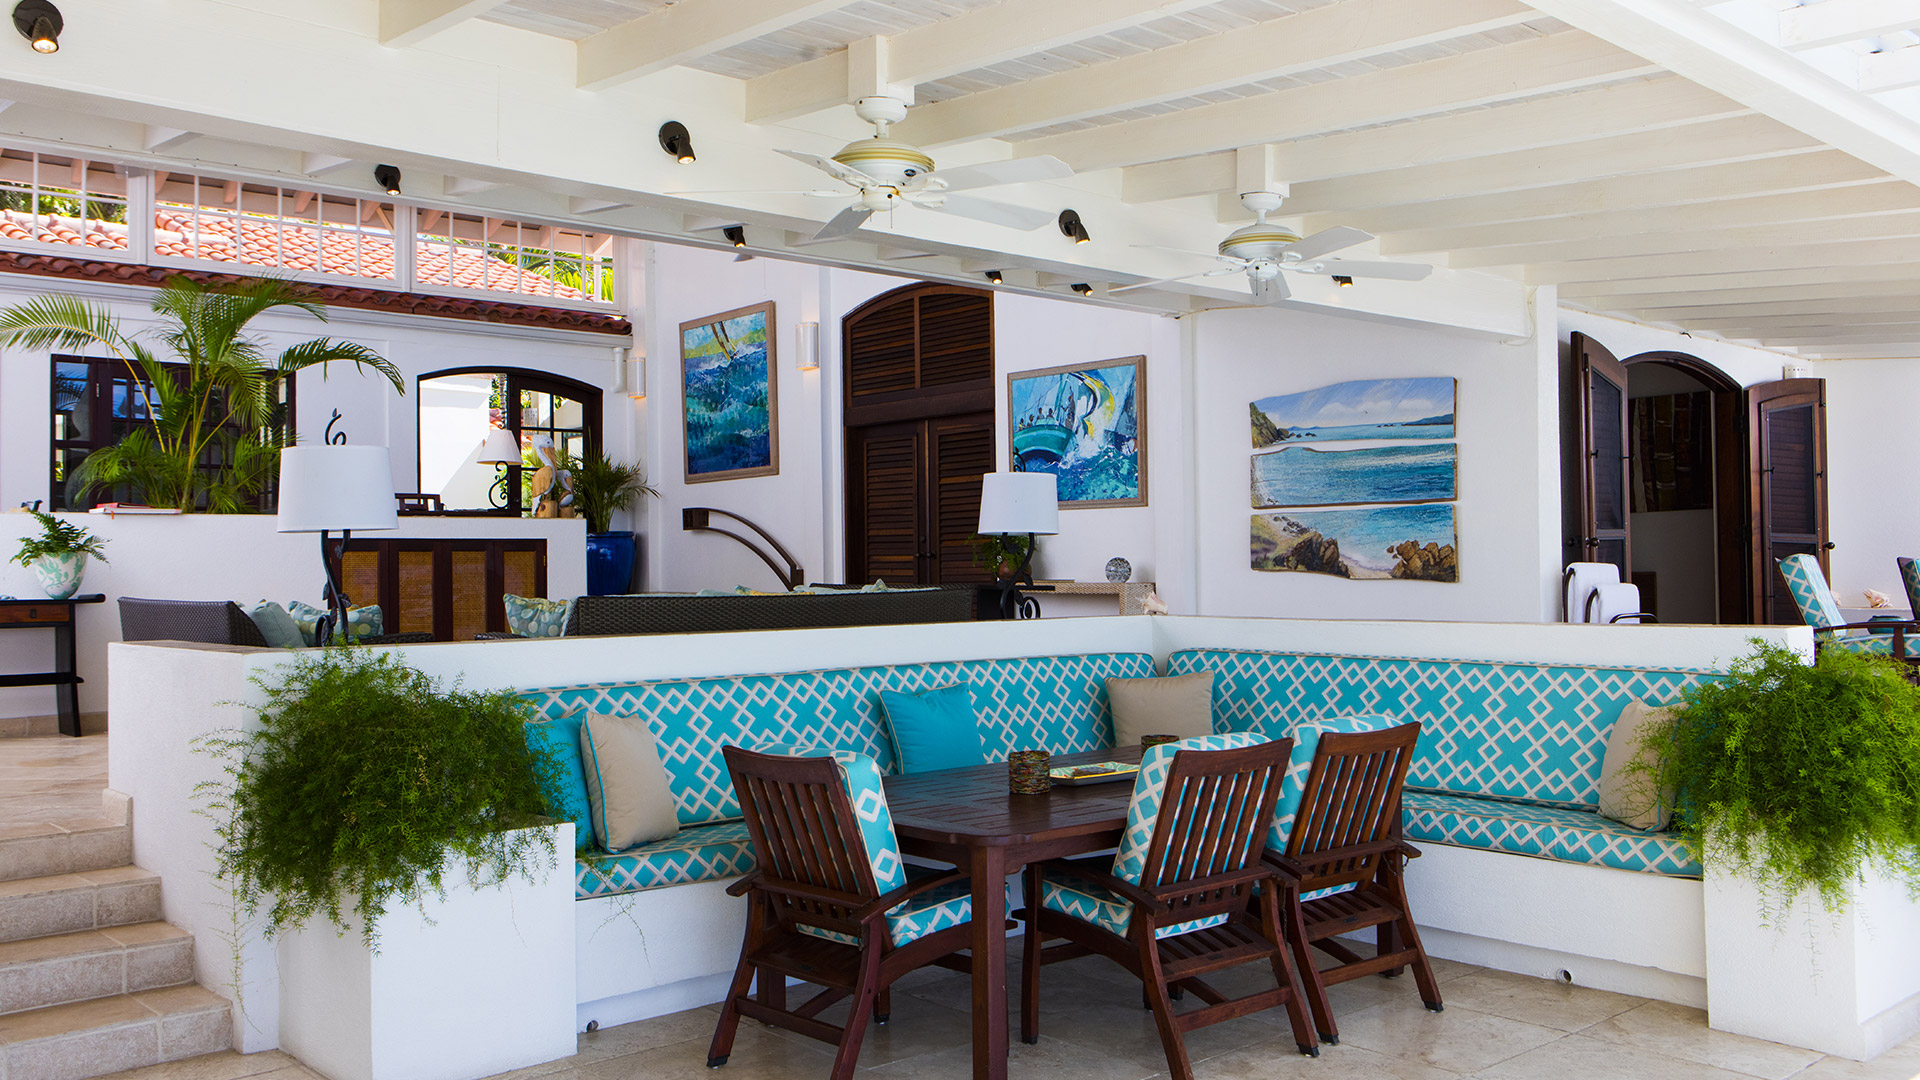 Sea Horse - 3 Bedroom Private Villa | Jumby Bay Island Antigua